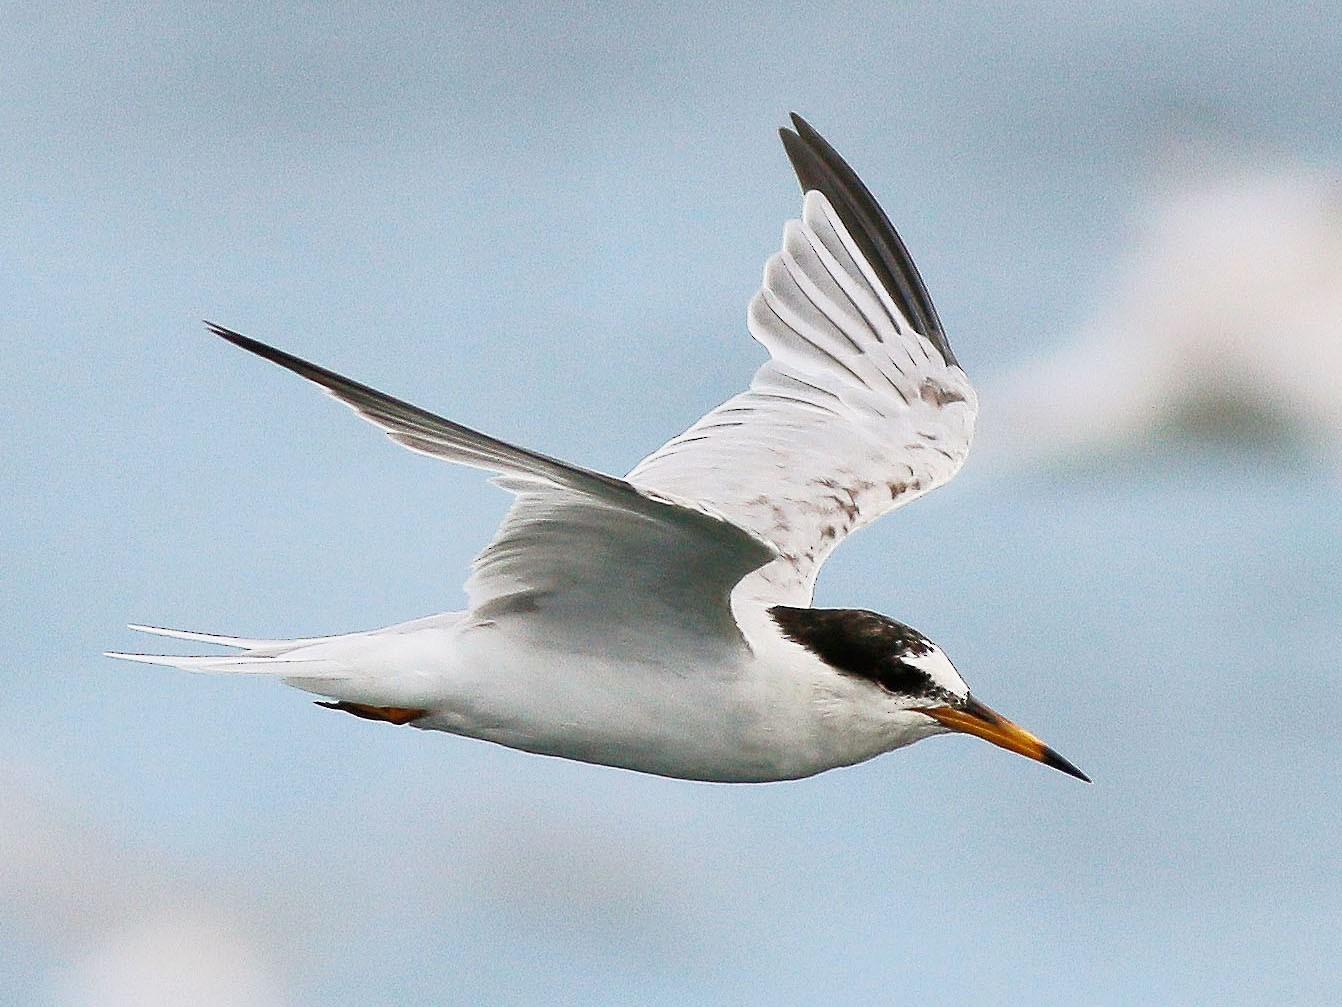 Little Tern - Neoh Hor Kee